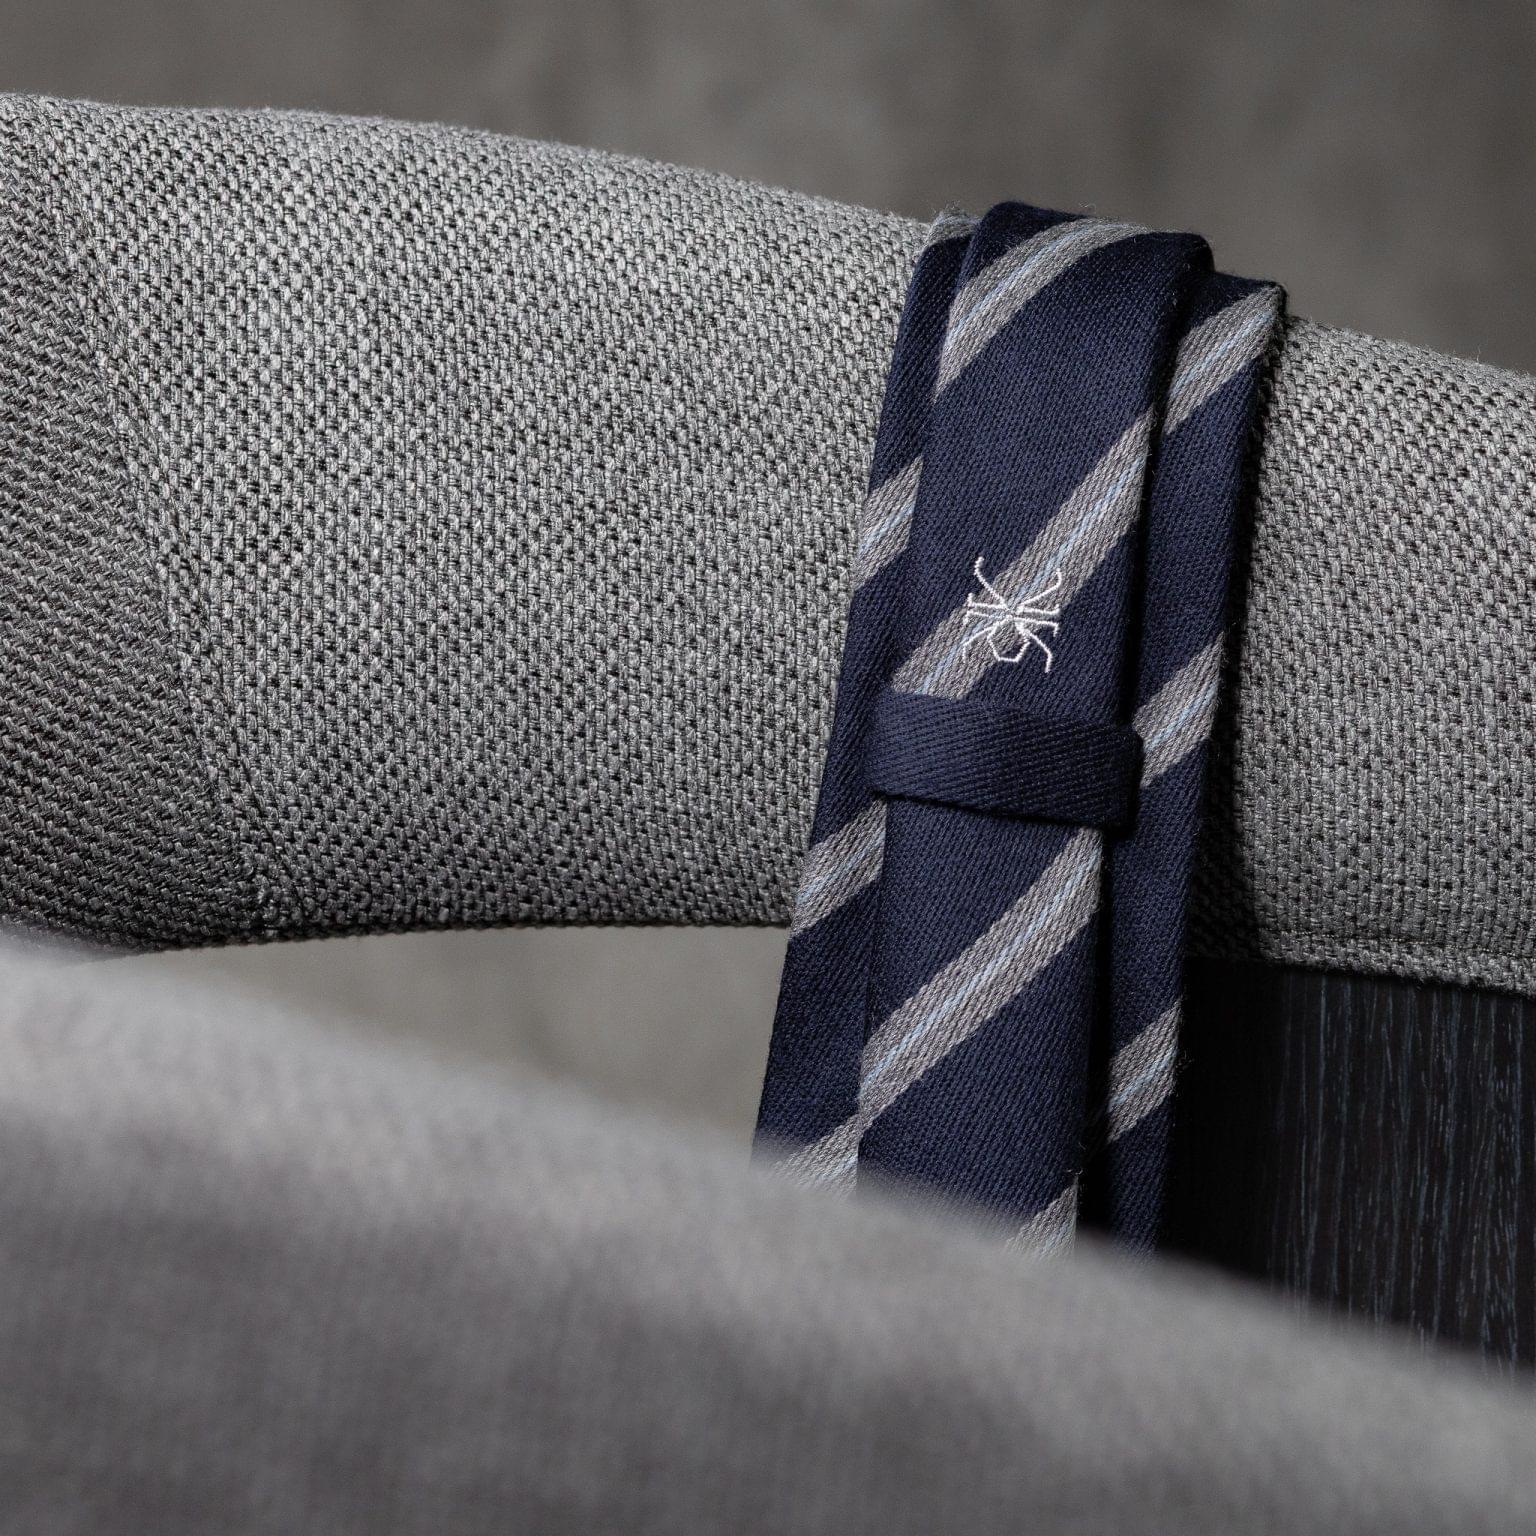 WOOL-LANA-0510-Tie-Initials-Corbata-Iniciales-The-Seelk-4